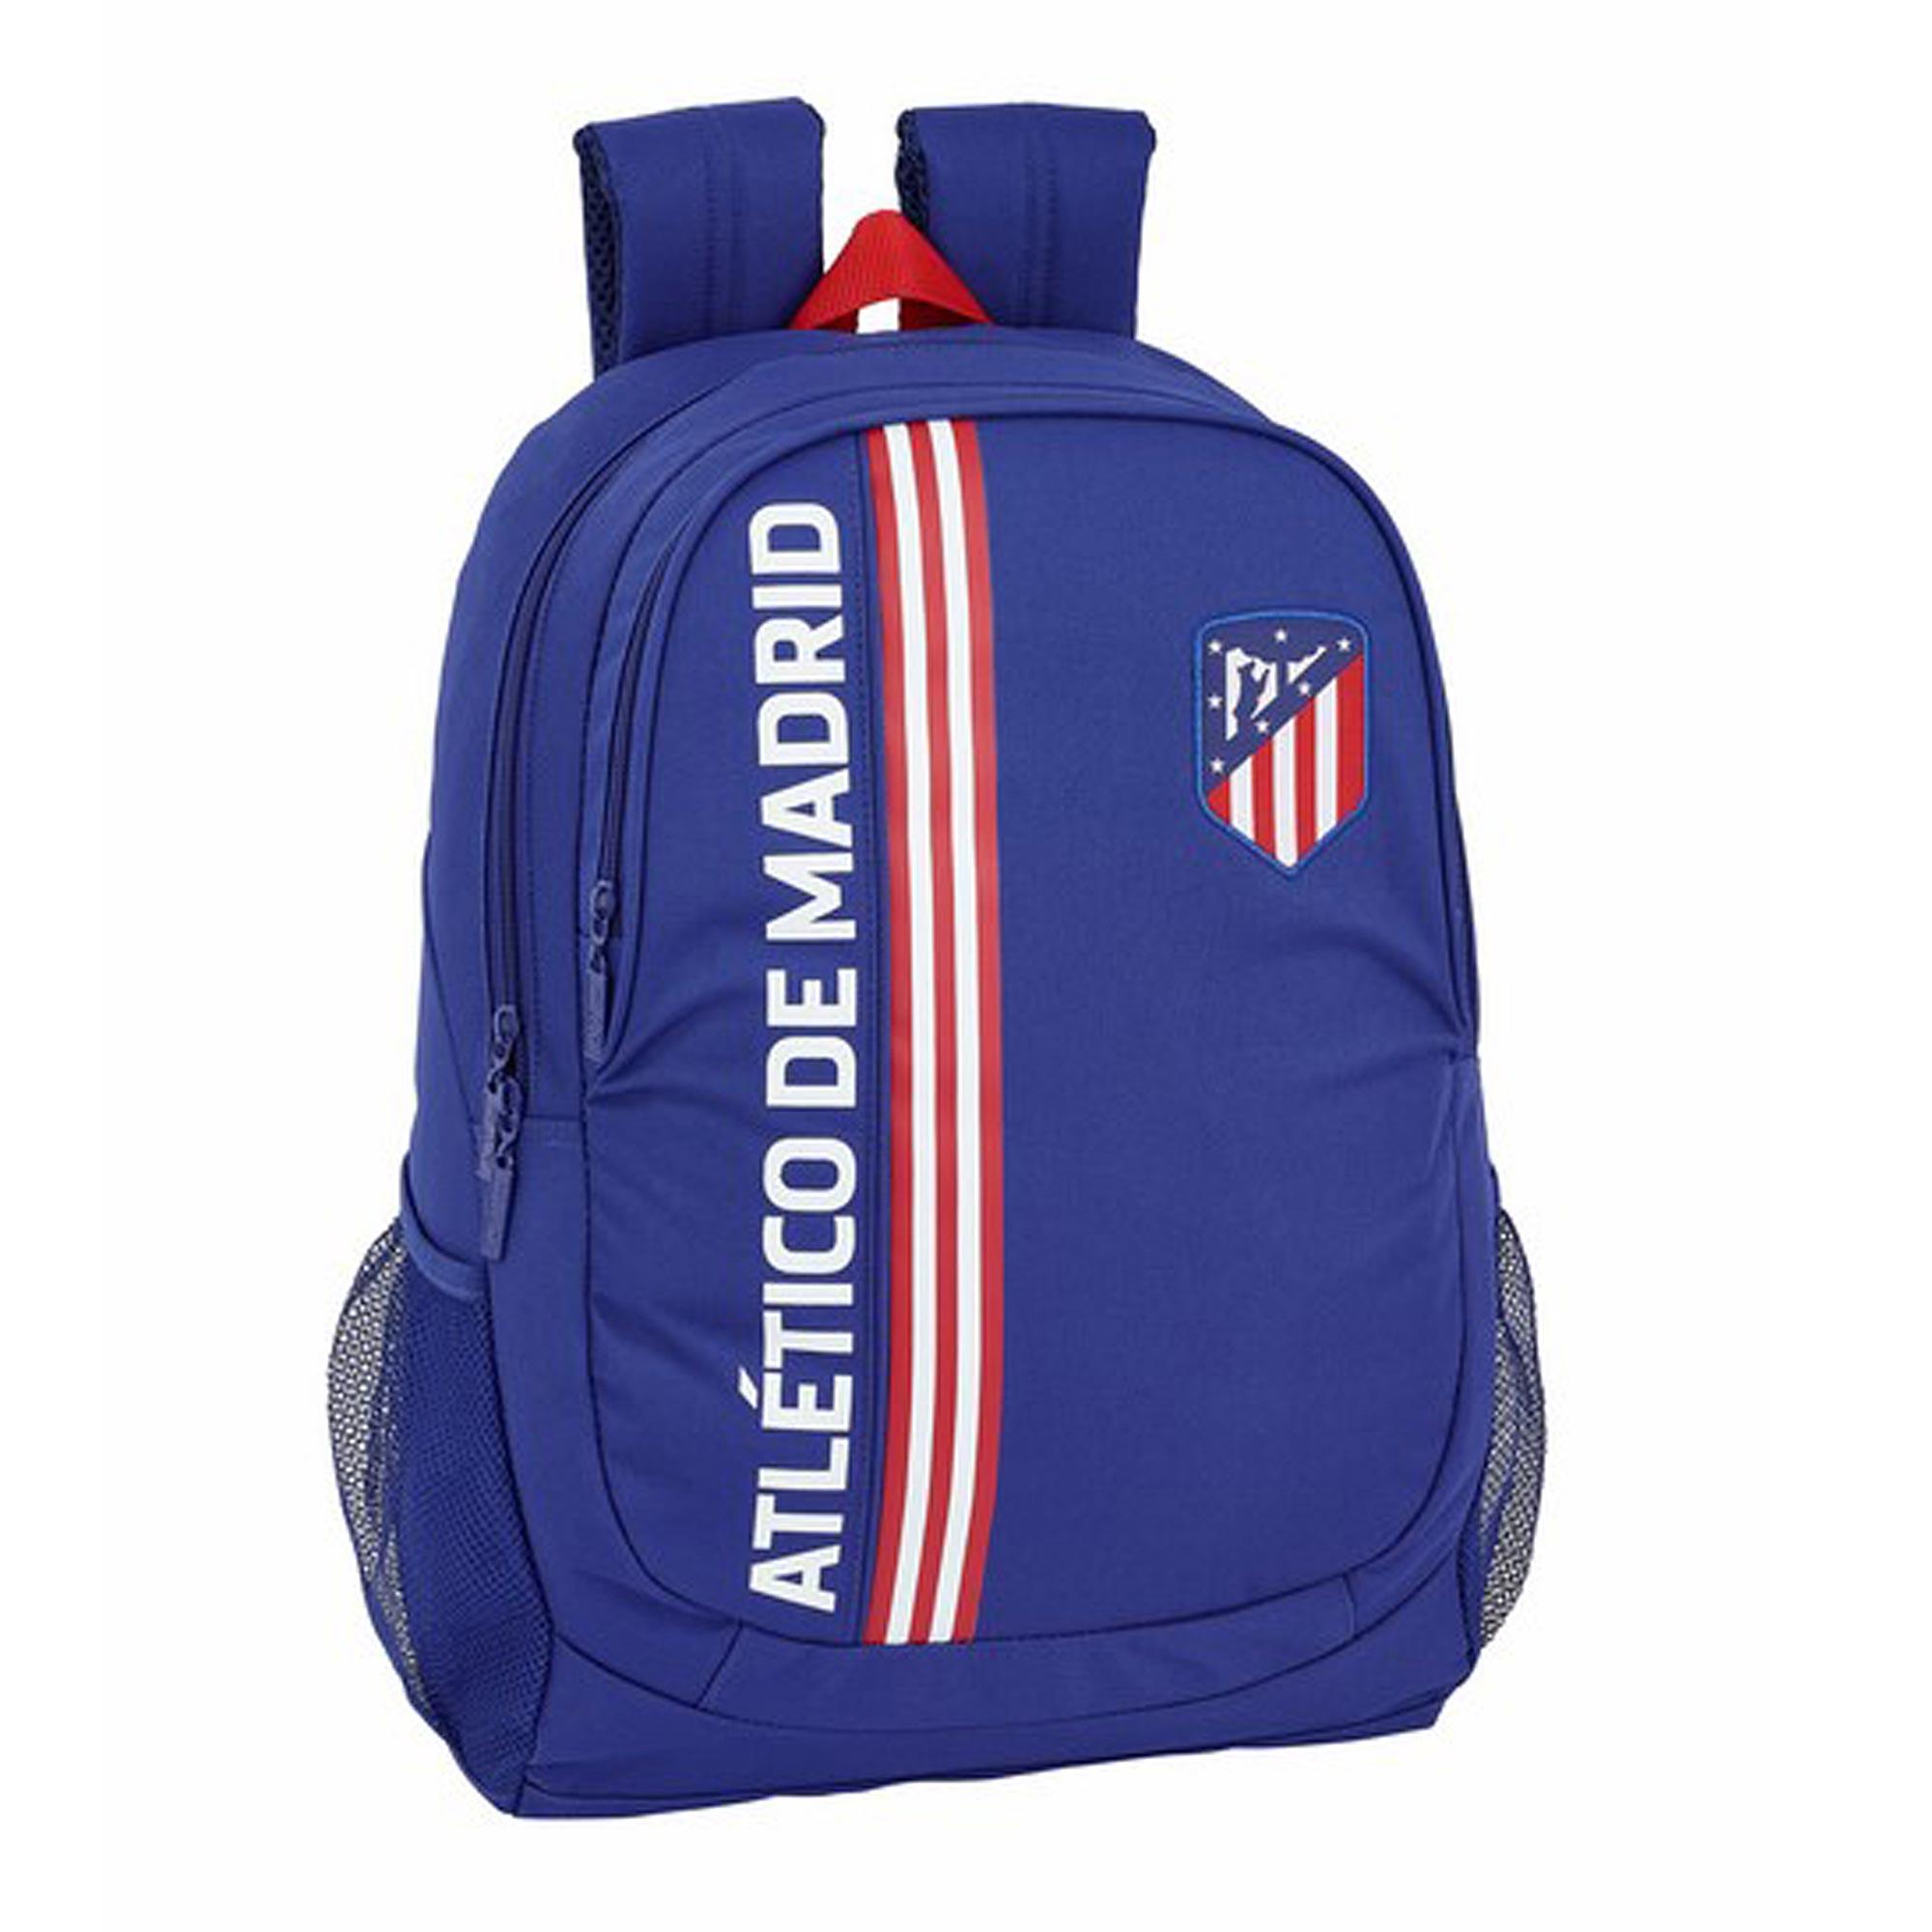 Club Branded / Mochila del Atlético de Madrid – Azul marino